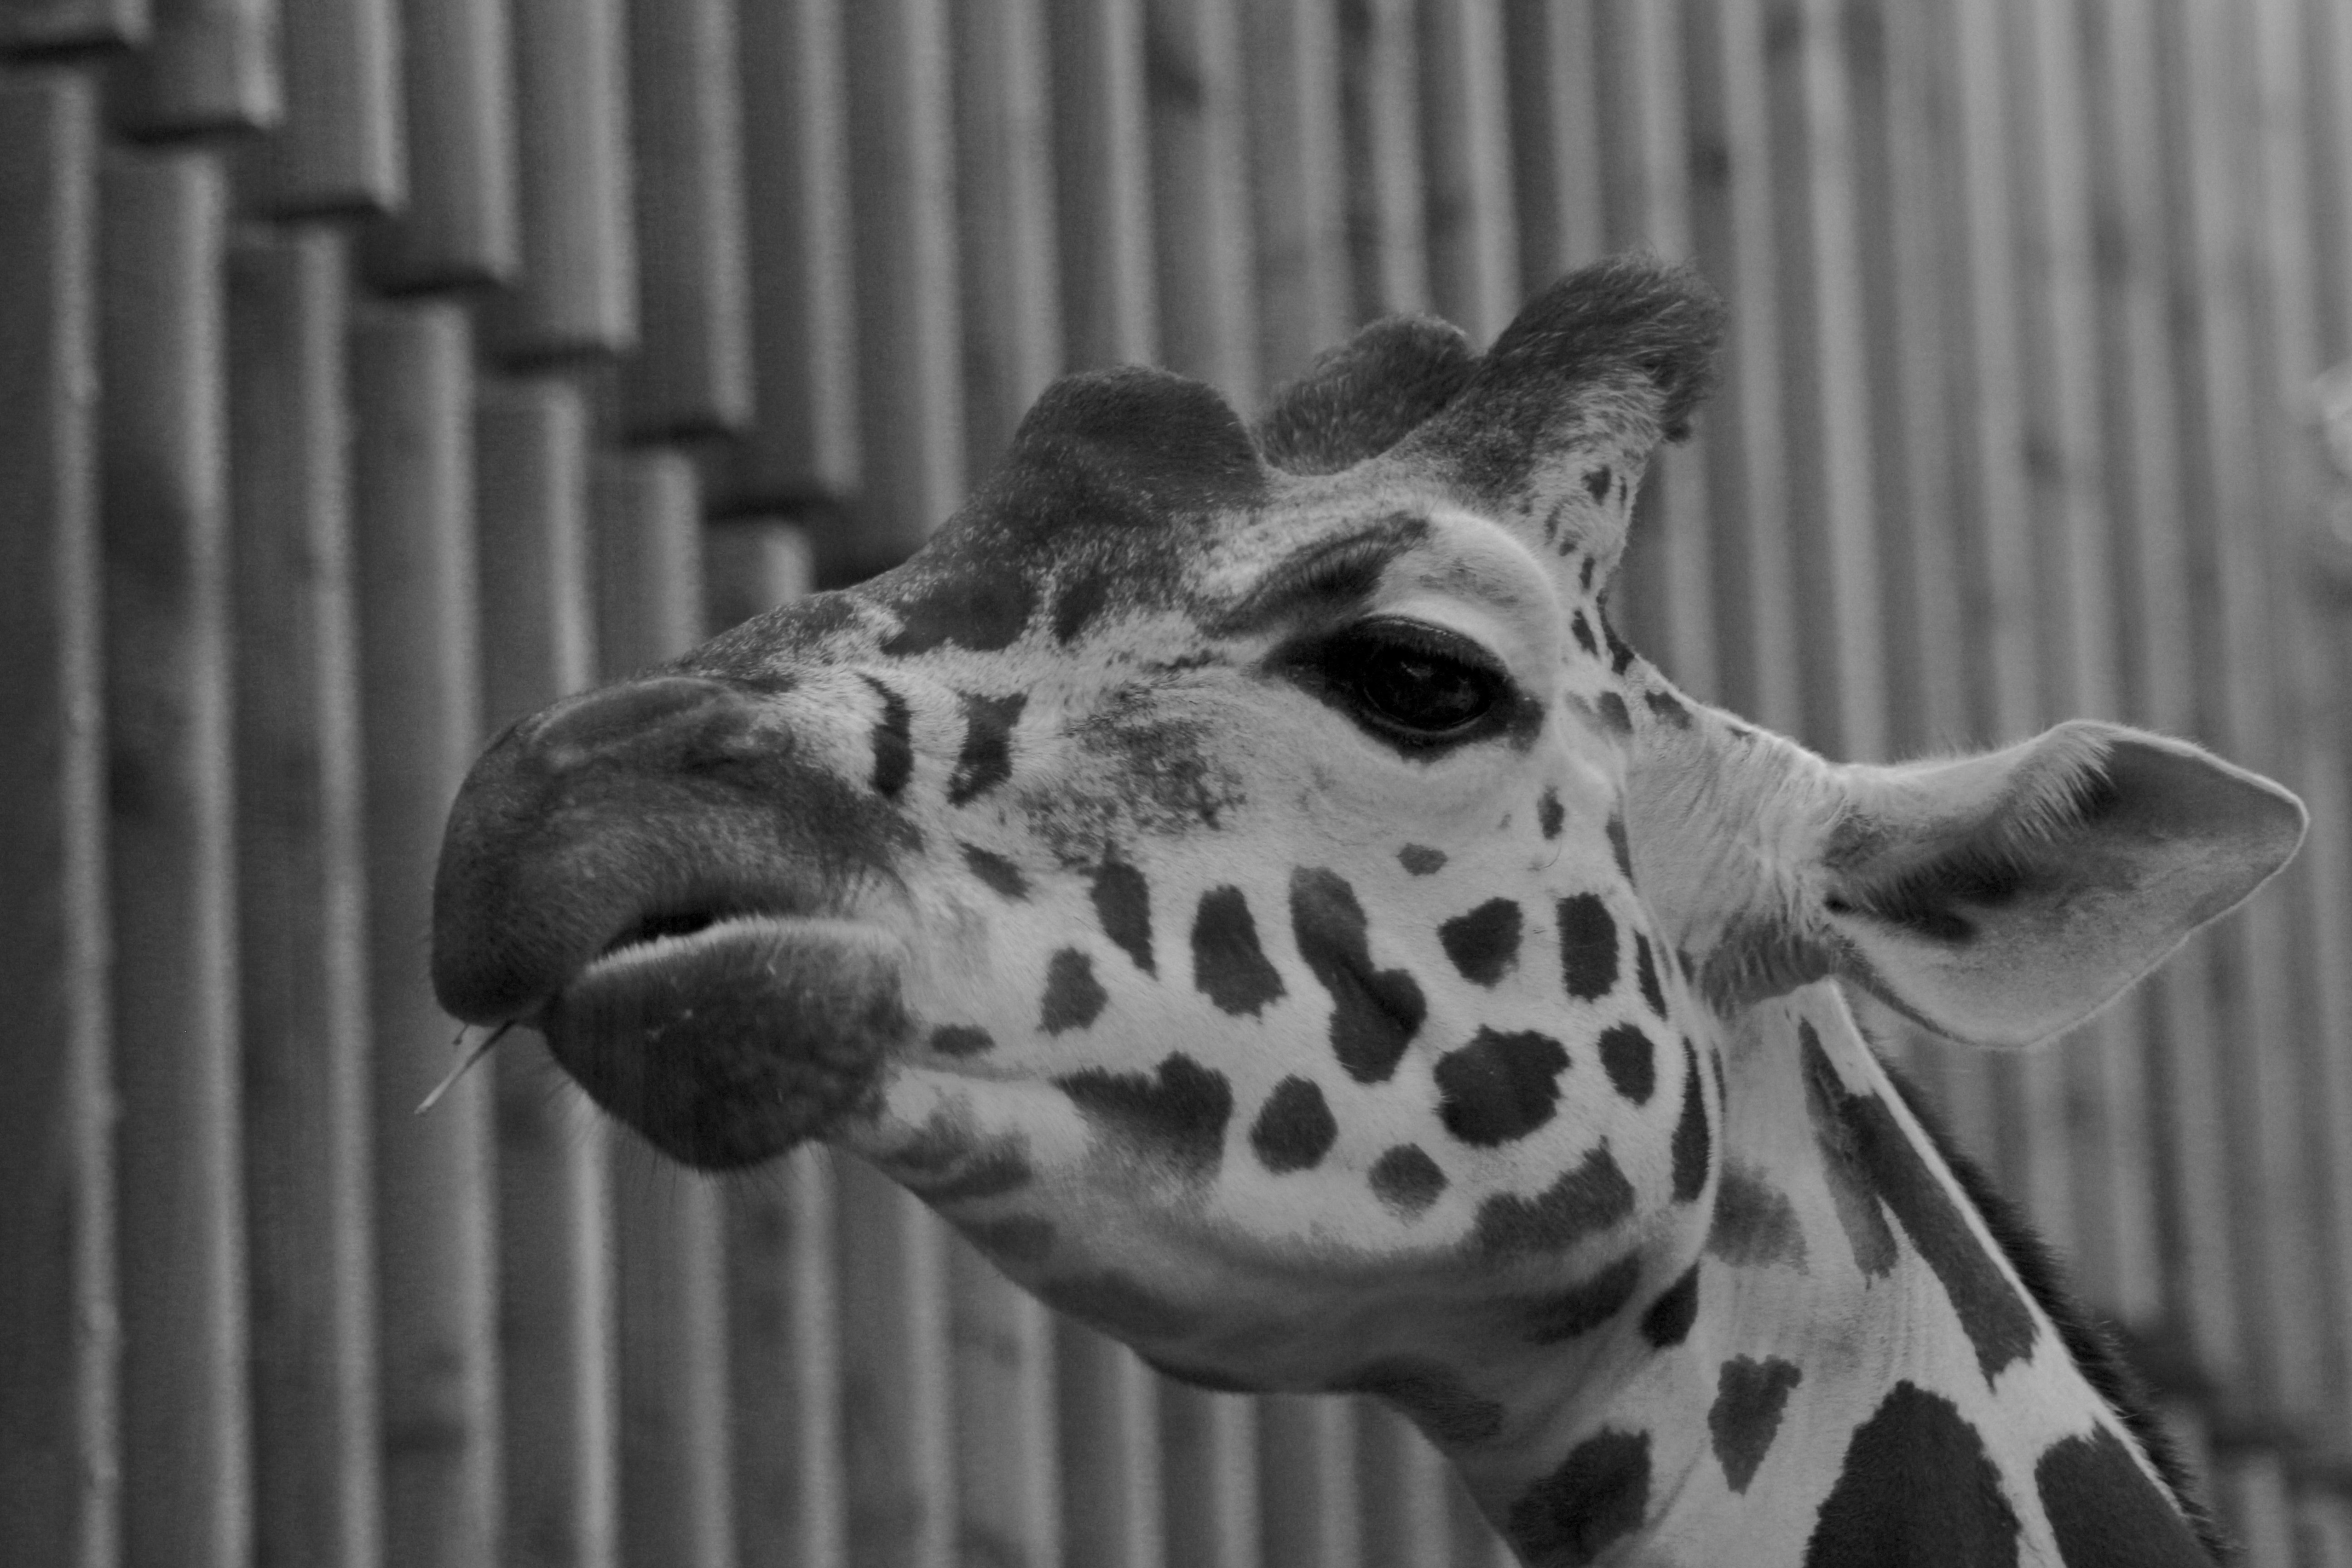 Greyscale photograph of giraffe